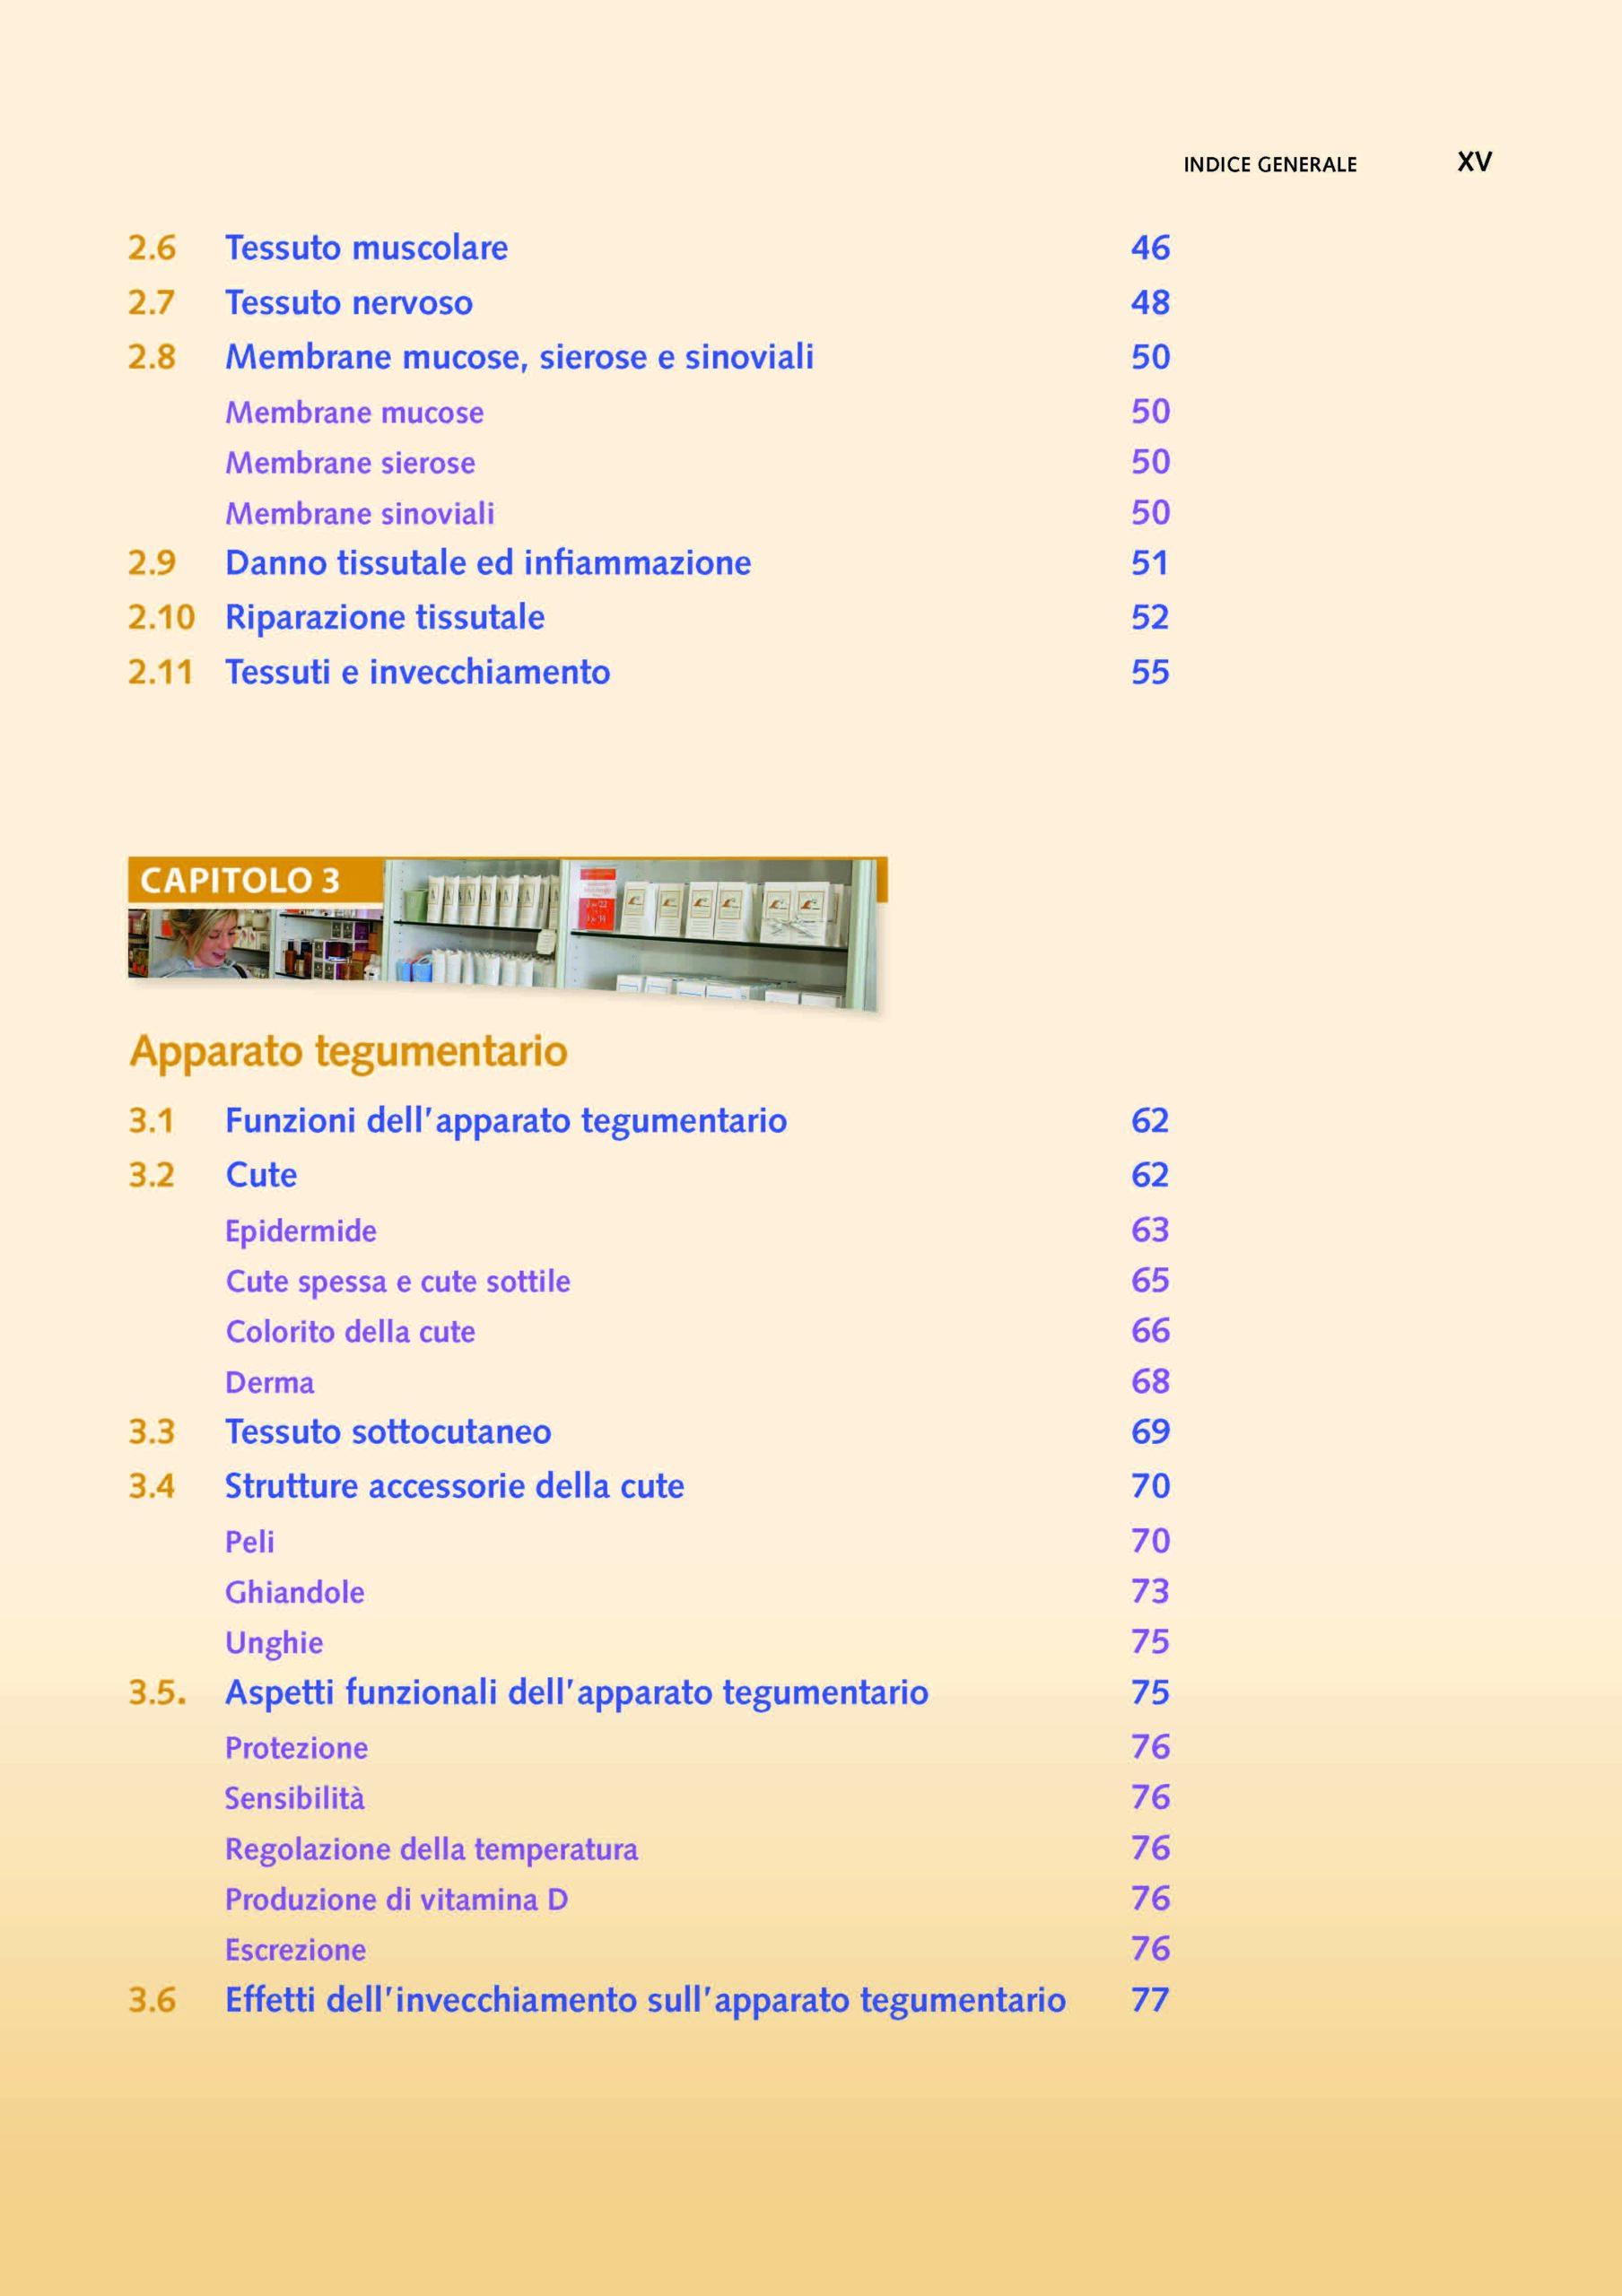 https://www.idelsongnocchi.com/shop/wp-content/uploads/2021/06/Seeley-ANATOMIA.-V-Edizione.-Avantesto_Pagina_13-1-scaled.jpg